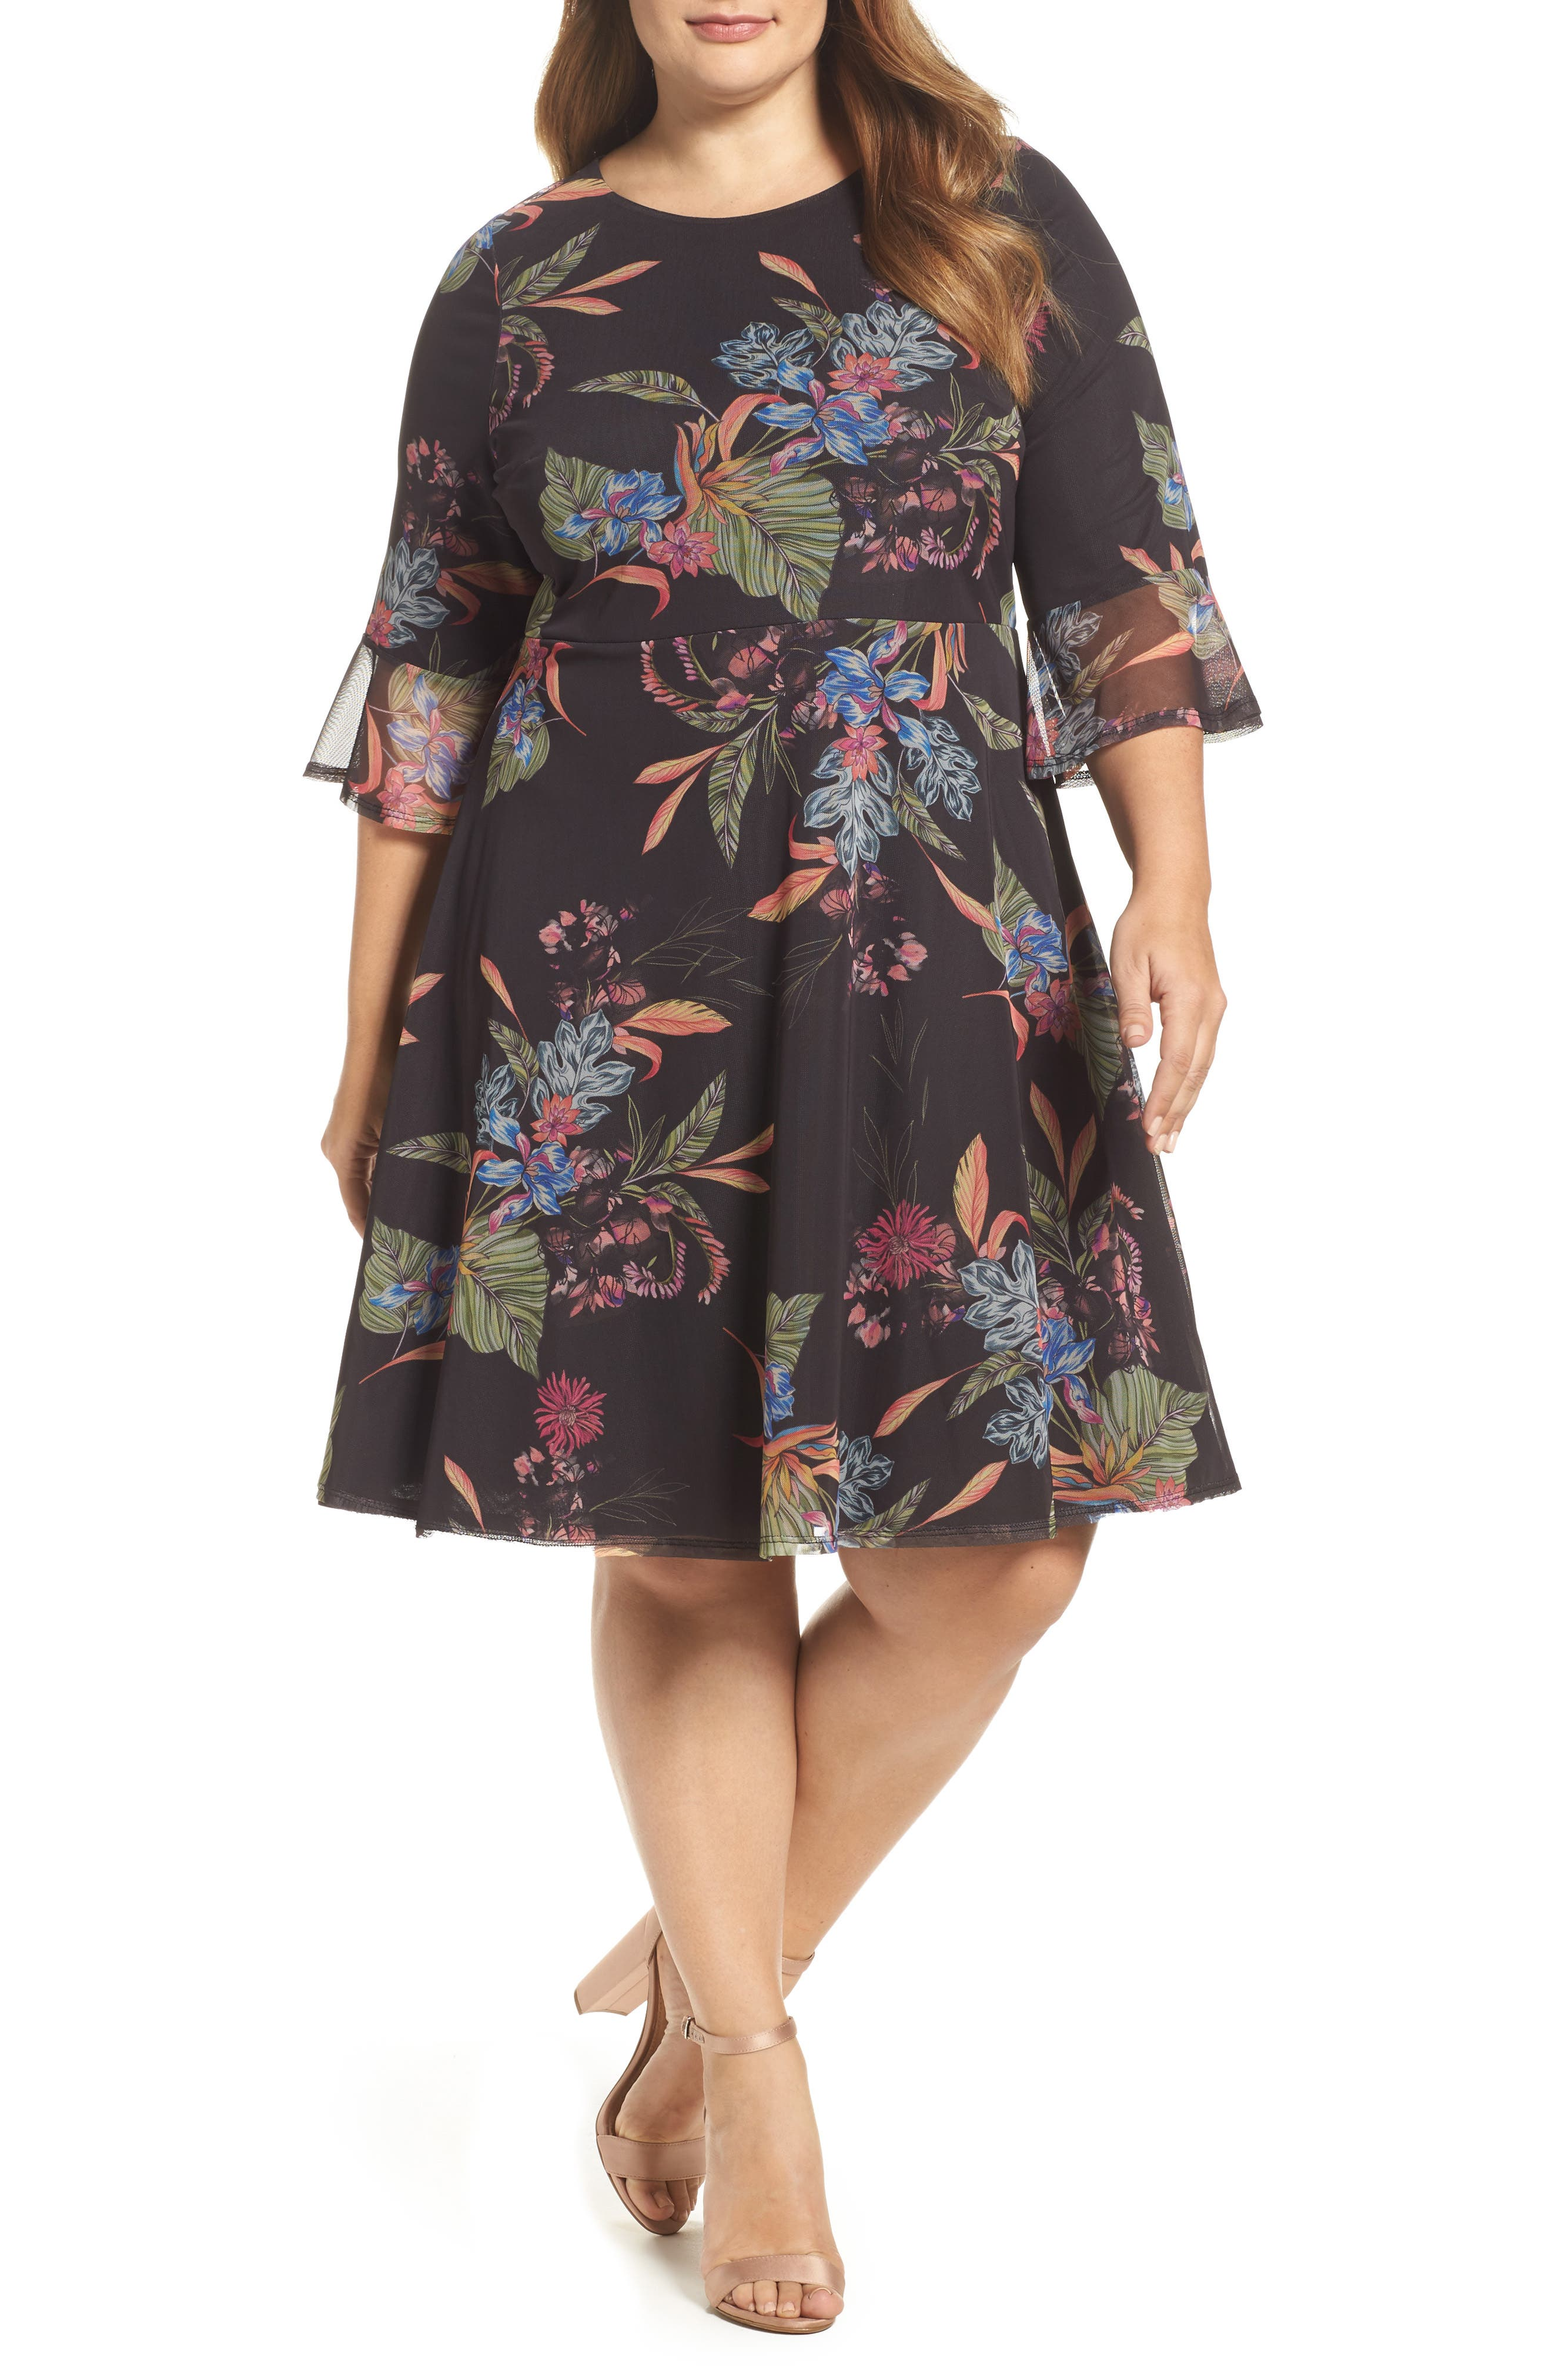 Alternate Image 1 Selected - Evans Tropic Print Mesh Dress (Plus Size)